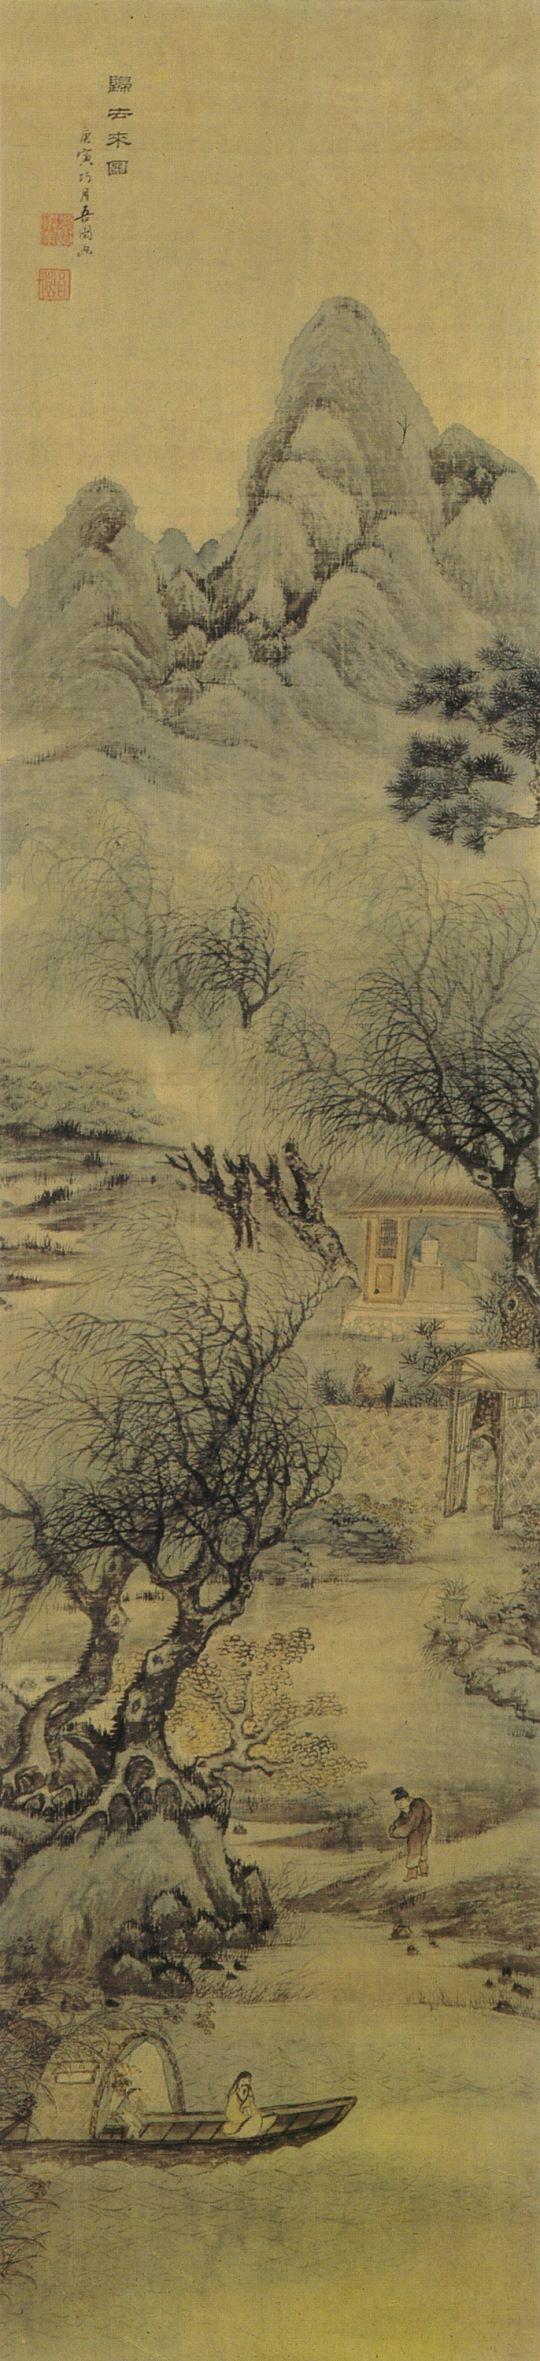 (Korea) 귀거래도 1890 by Jang Seung-eop (1843-1897). ca 19th century CE. colors on silk. Gansong Gallery, Korea.